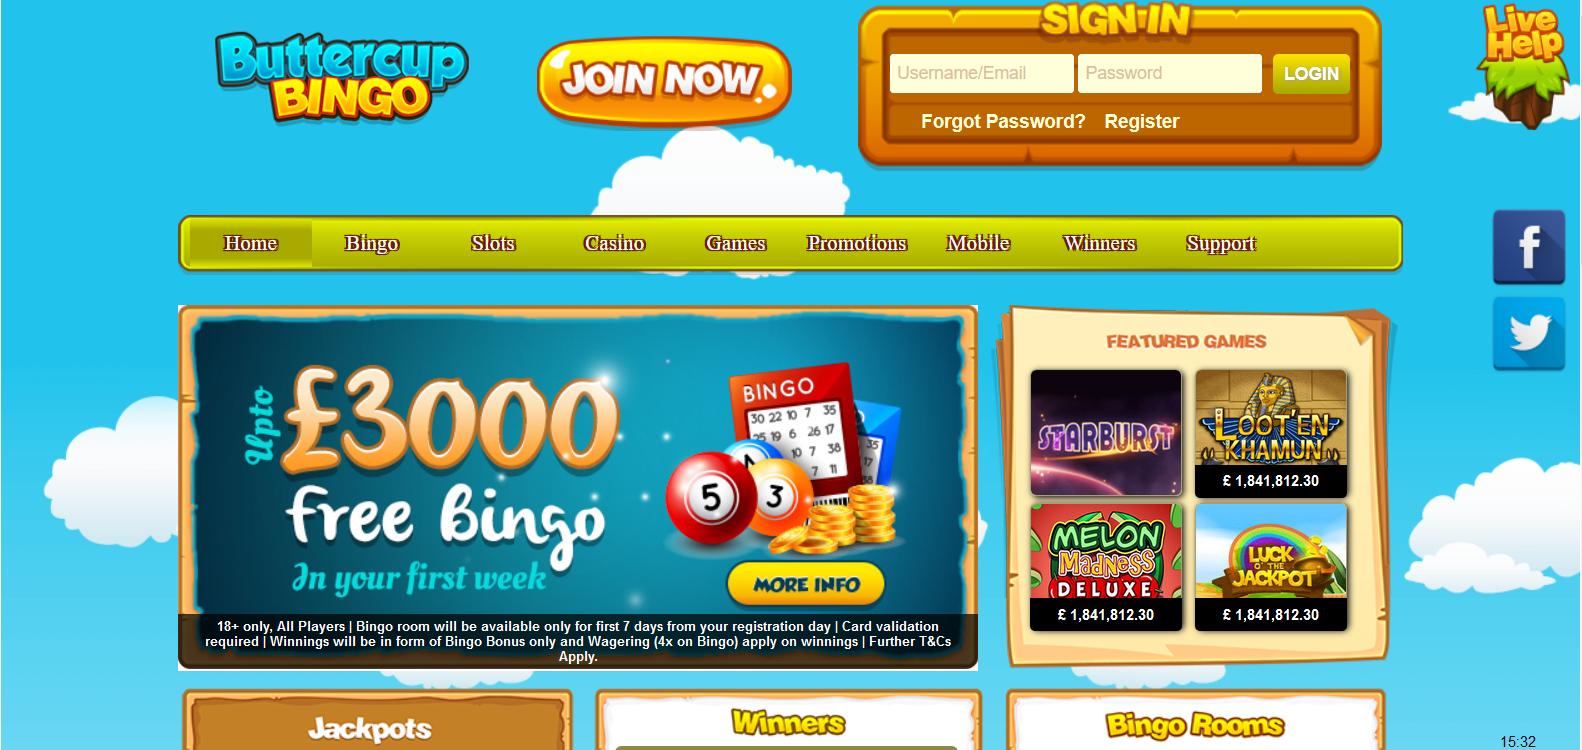 3 card poker online real money